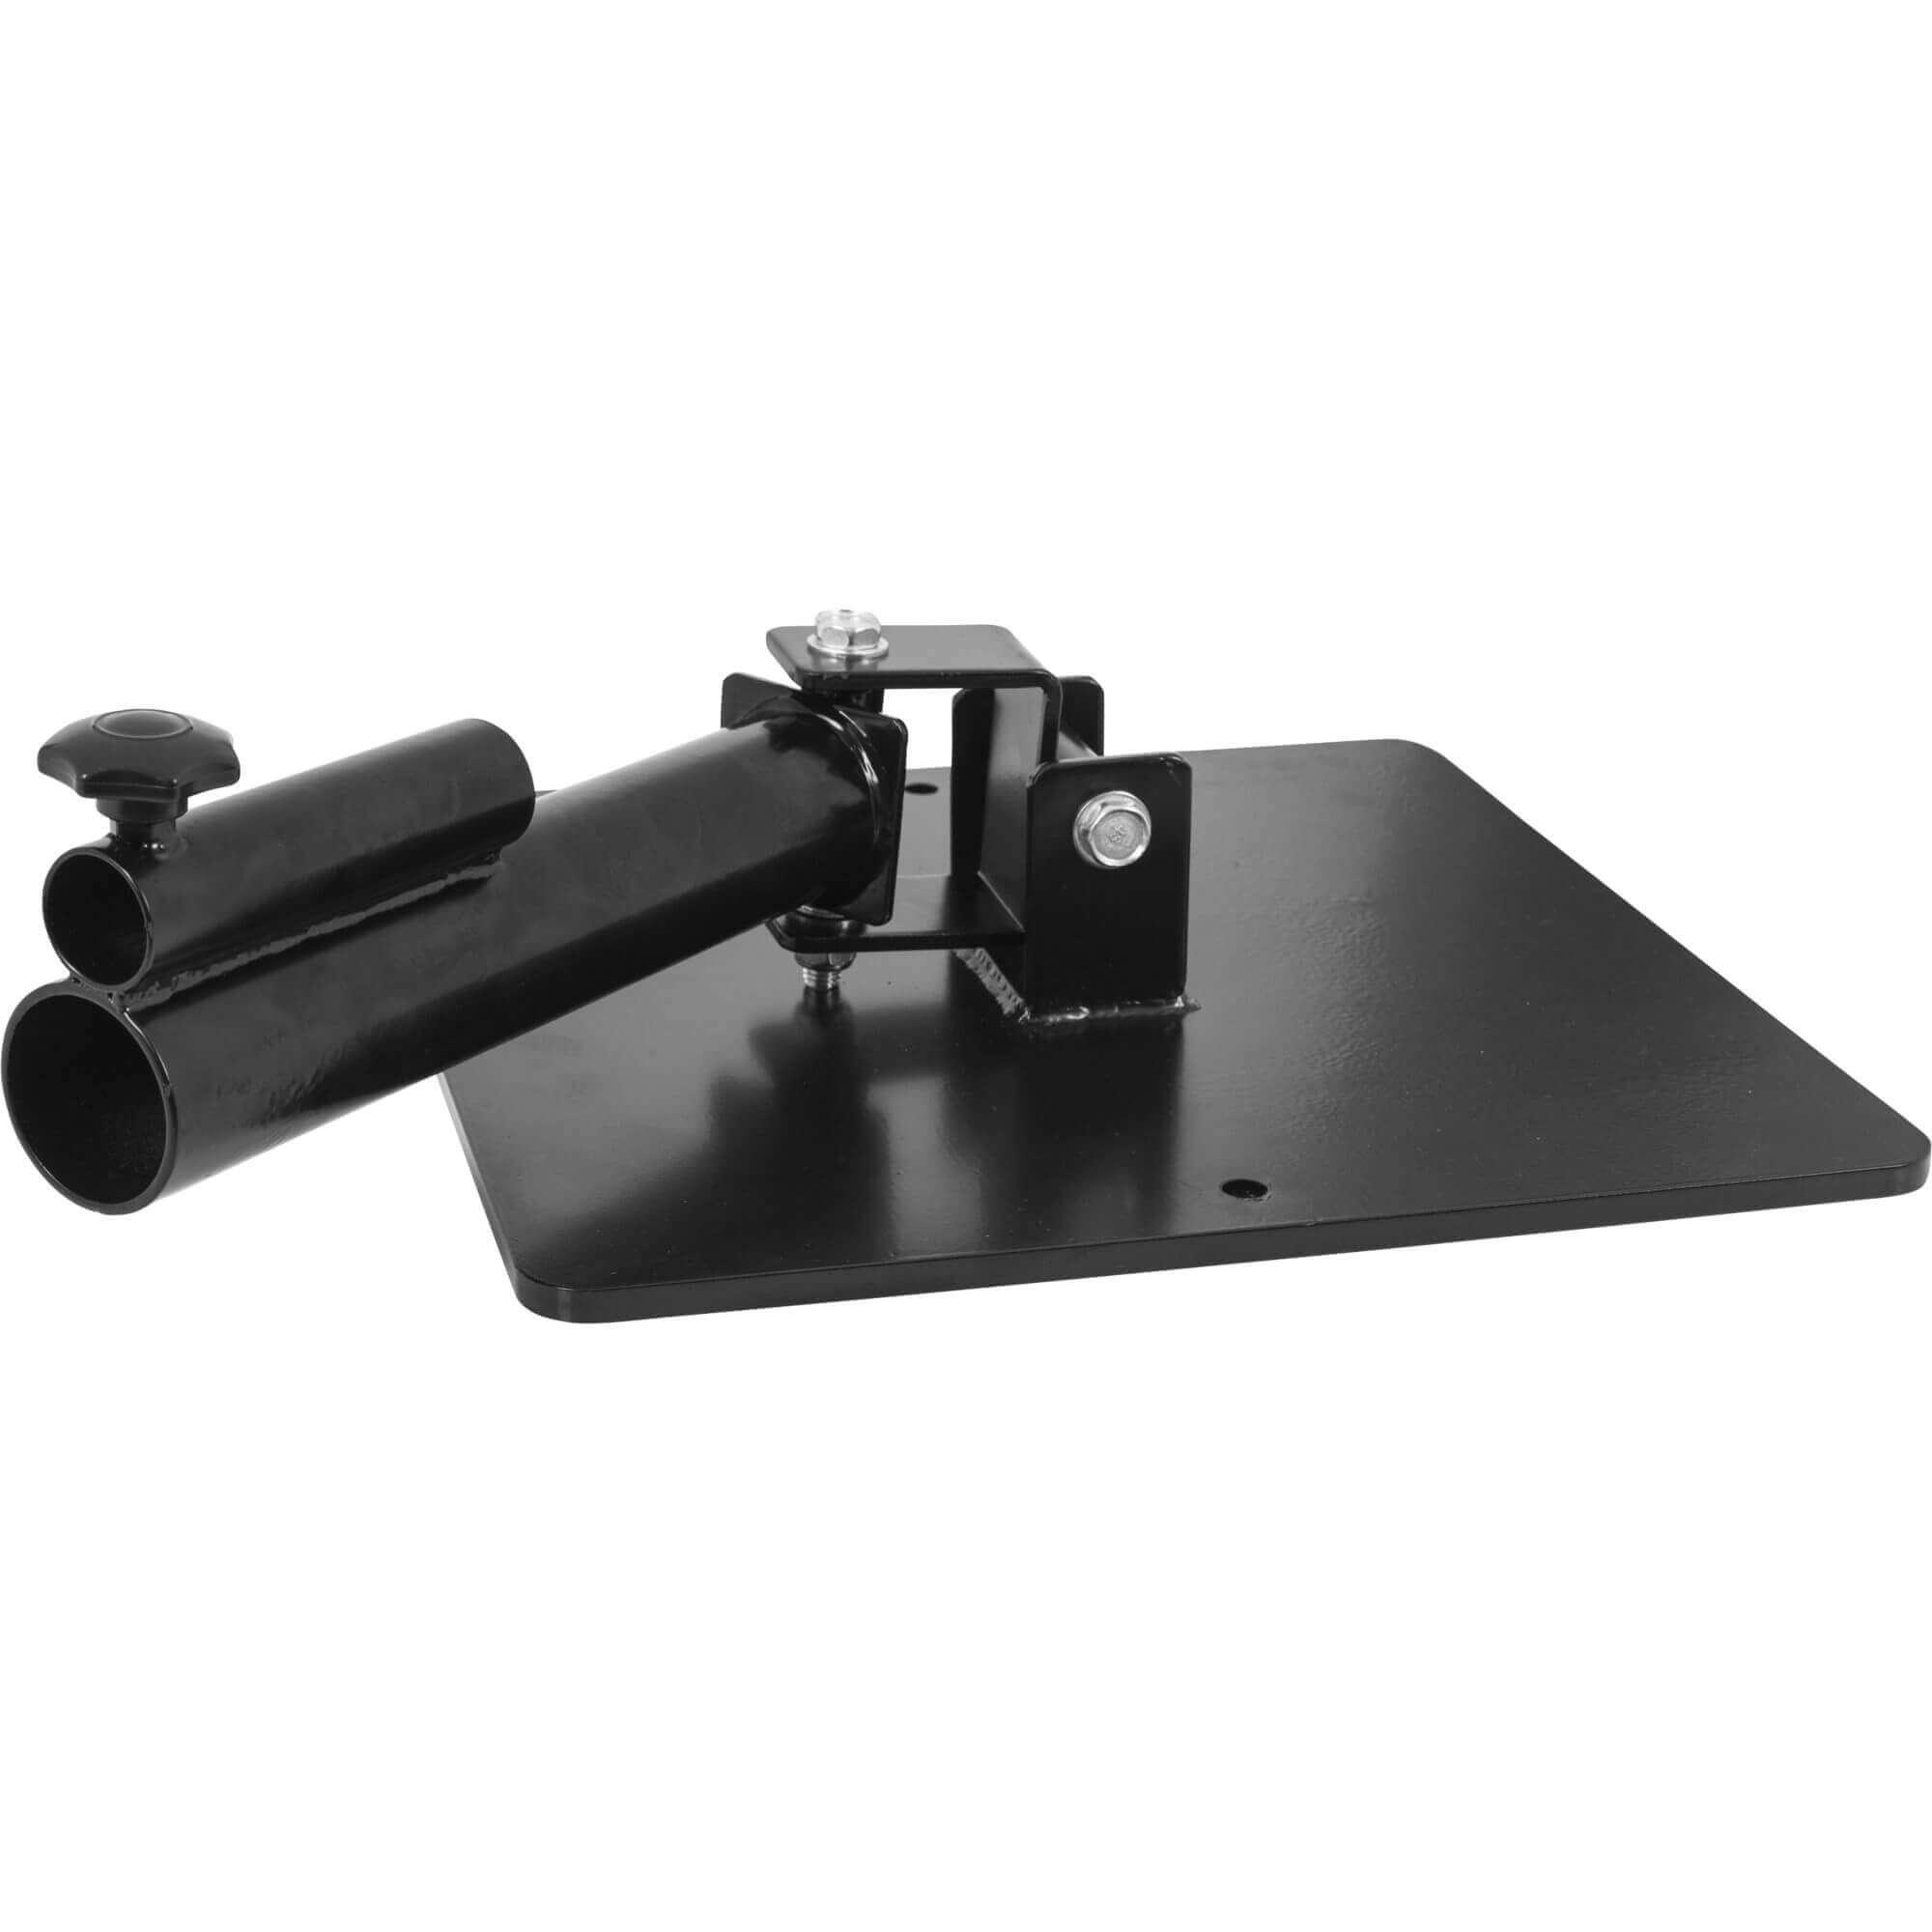 GORILLA SPORTS® Langhanteltrainer T-Bar Row Landmine Rückentrainer Core-Trainer